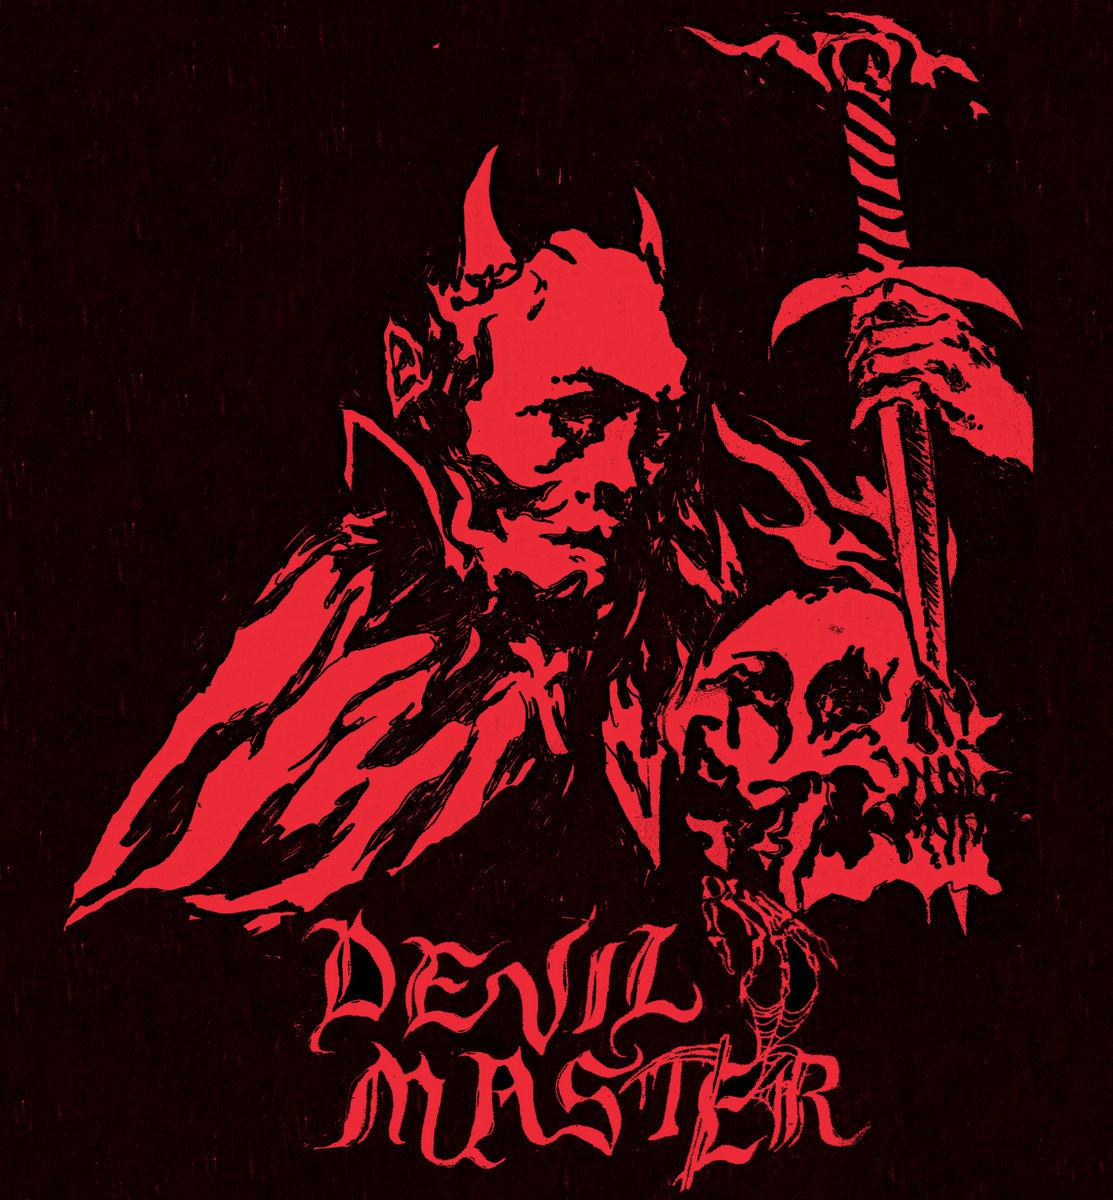 by DEVIL MASTER